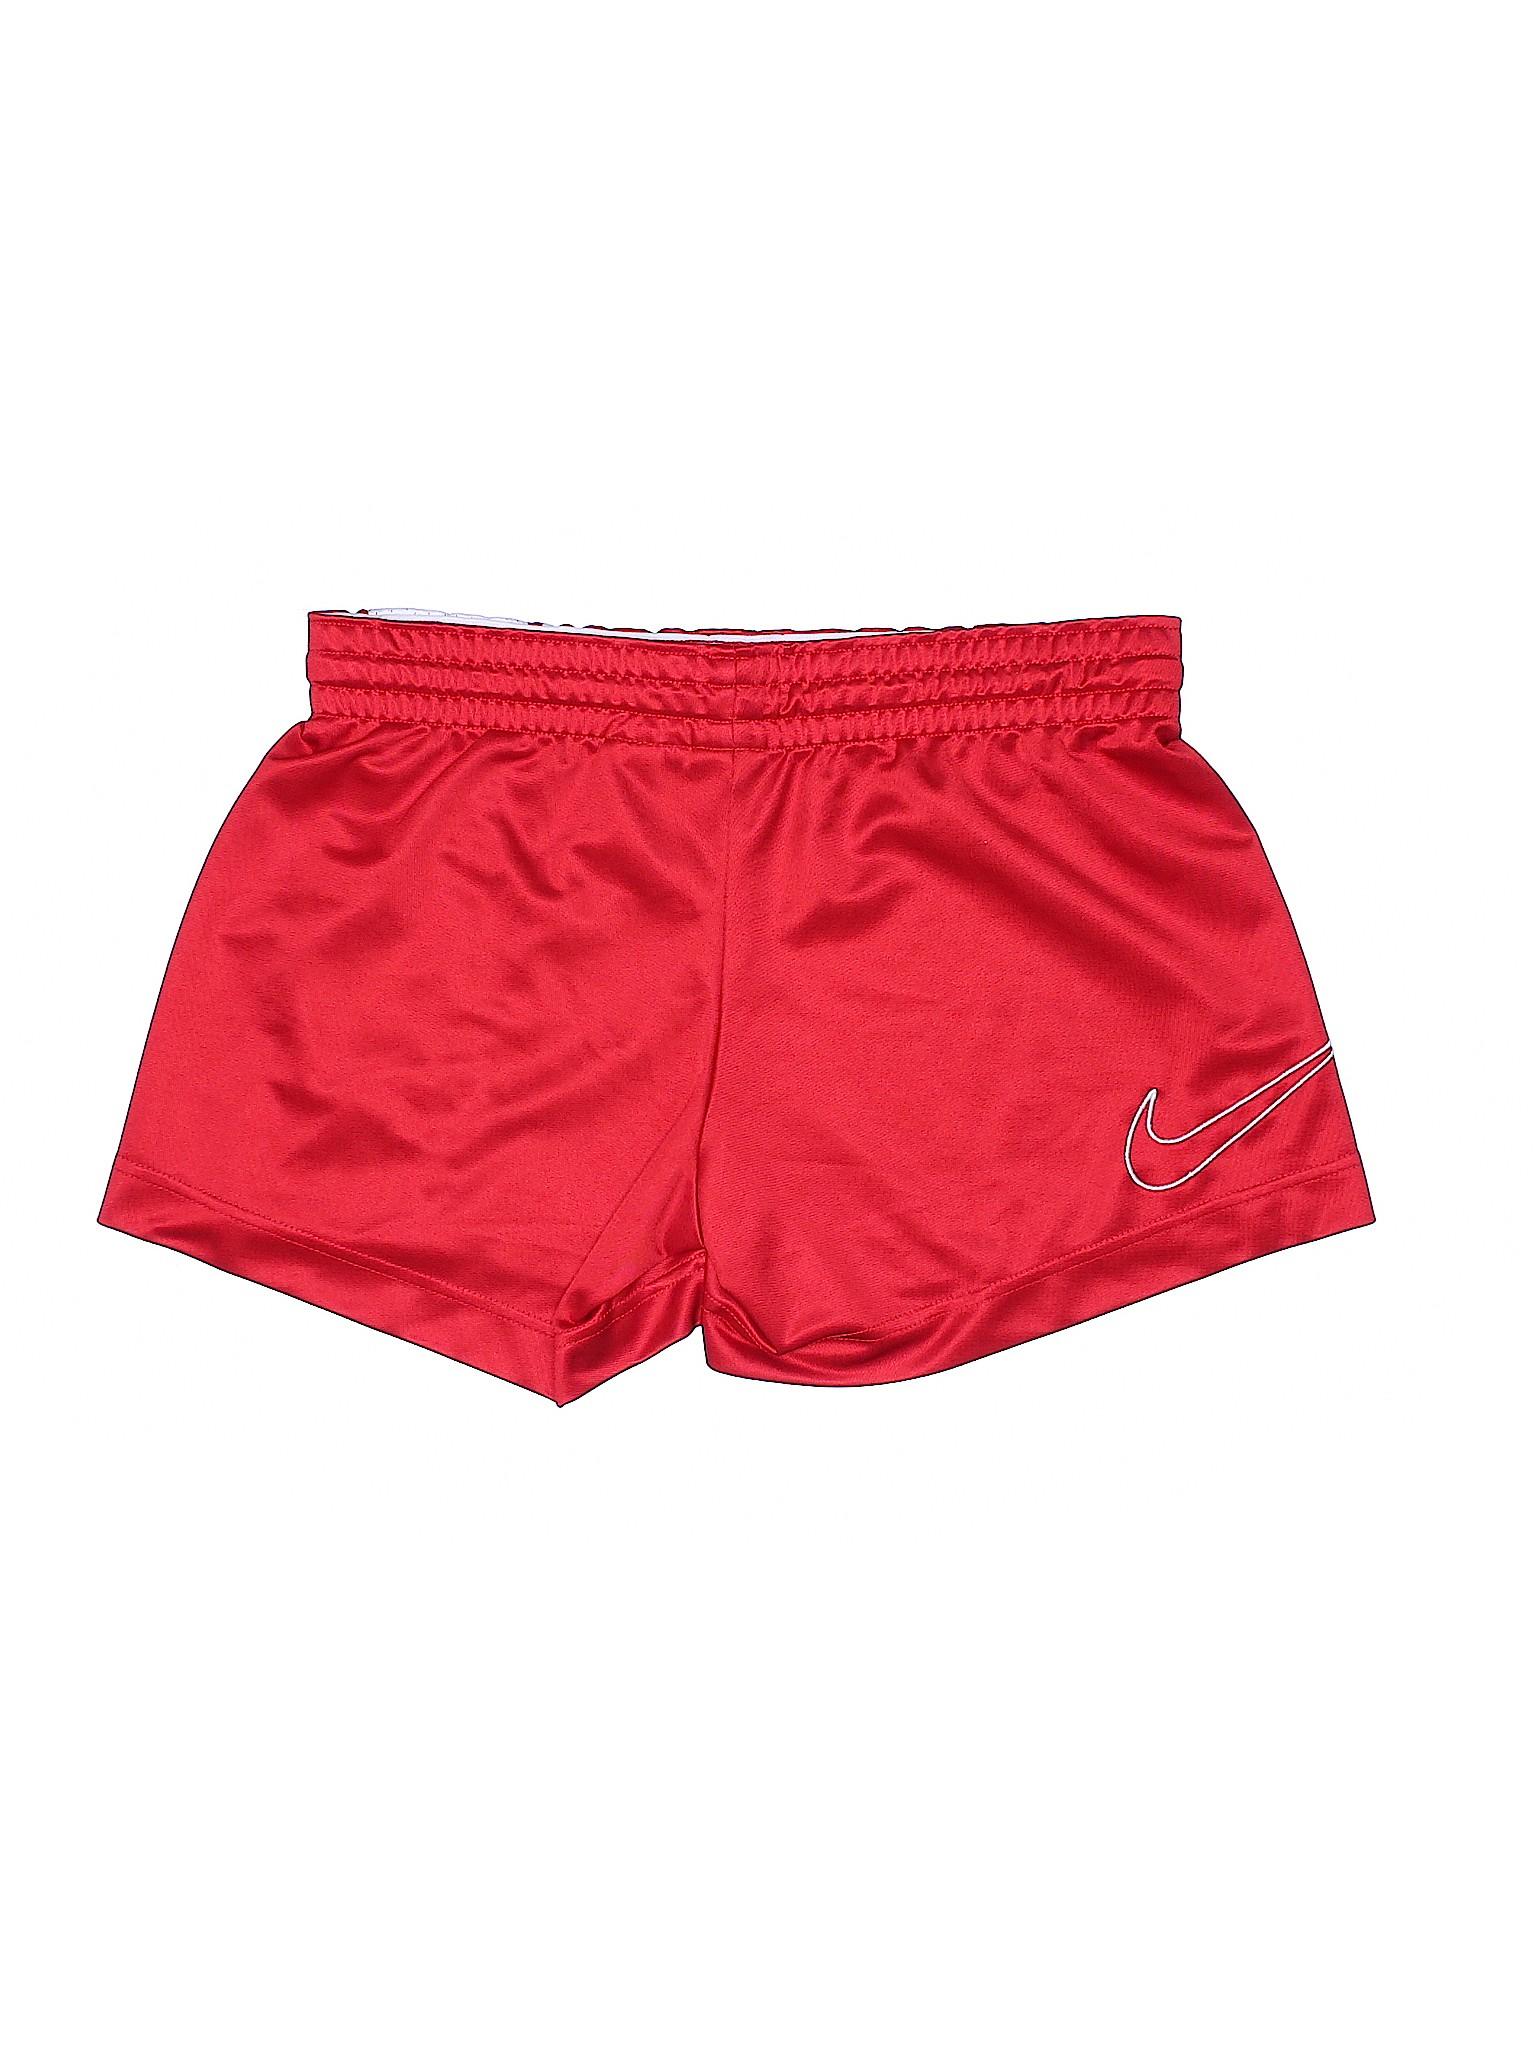 Athletic leisure Boutique leisure Nike Nike Boutique Shorts 4q4OwHB